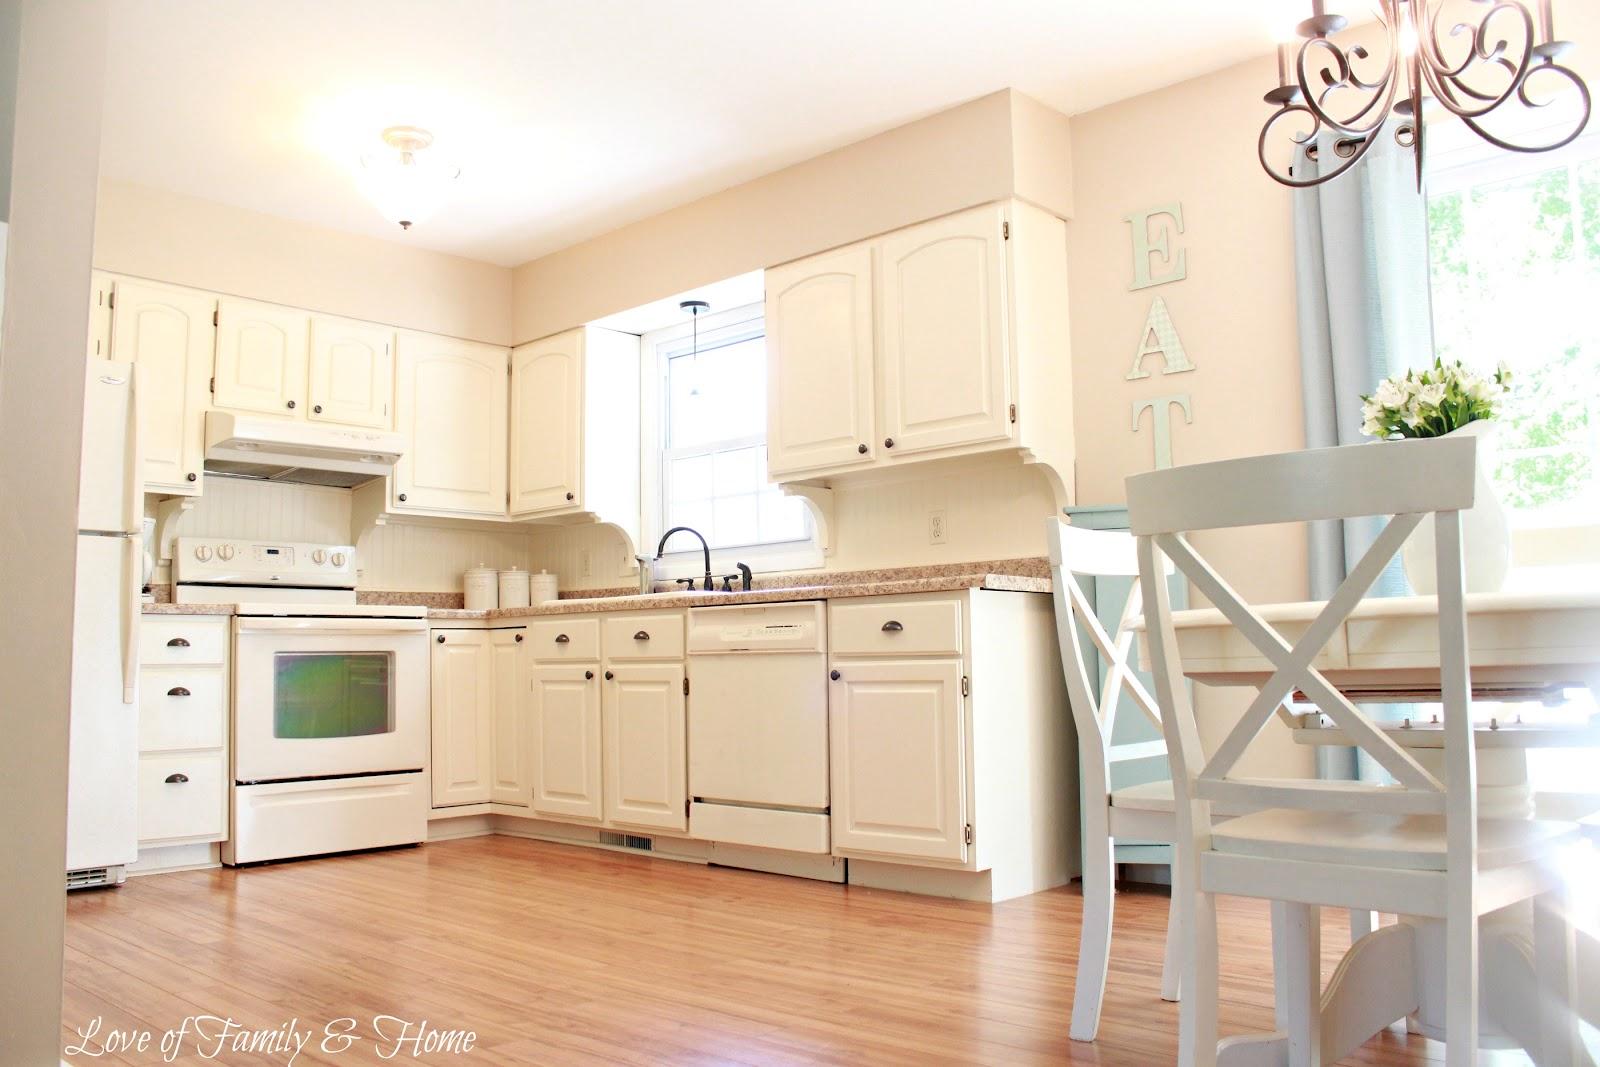 Beadboard Backsplash, Corbel Love, & A Few Other Kitchen